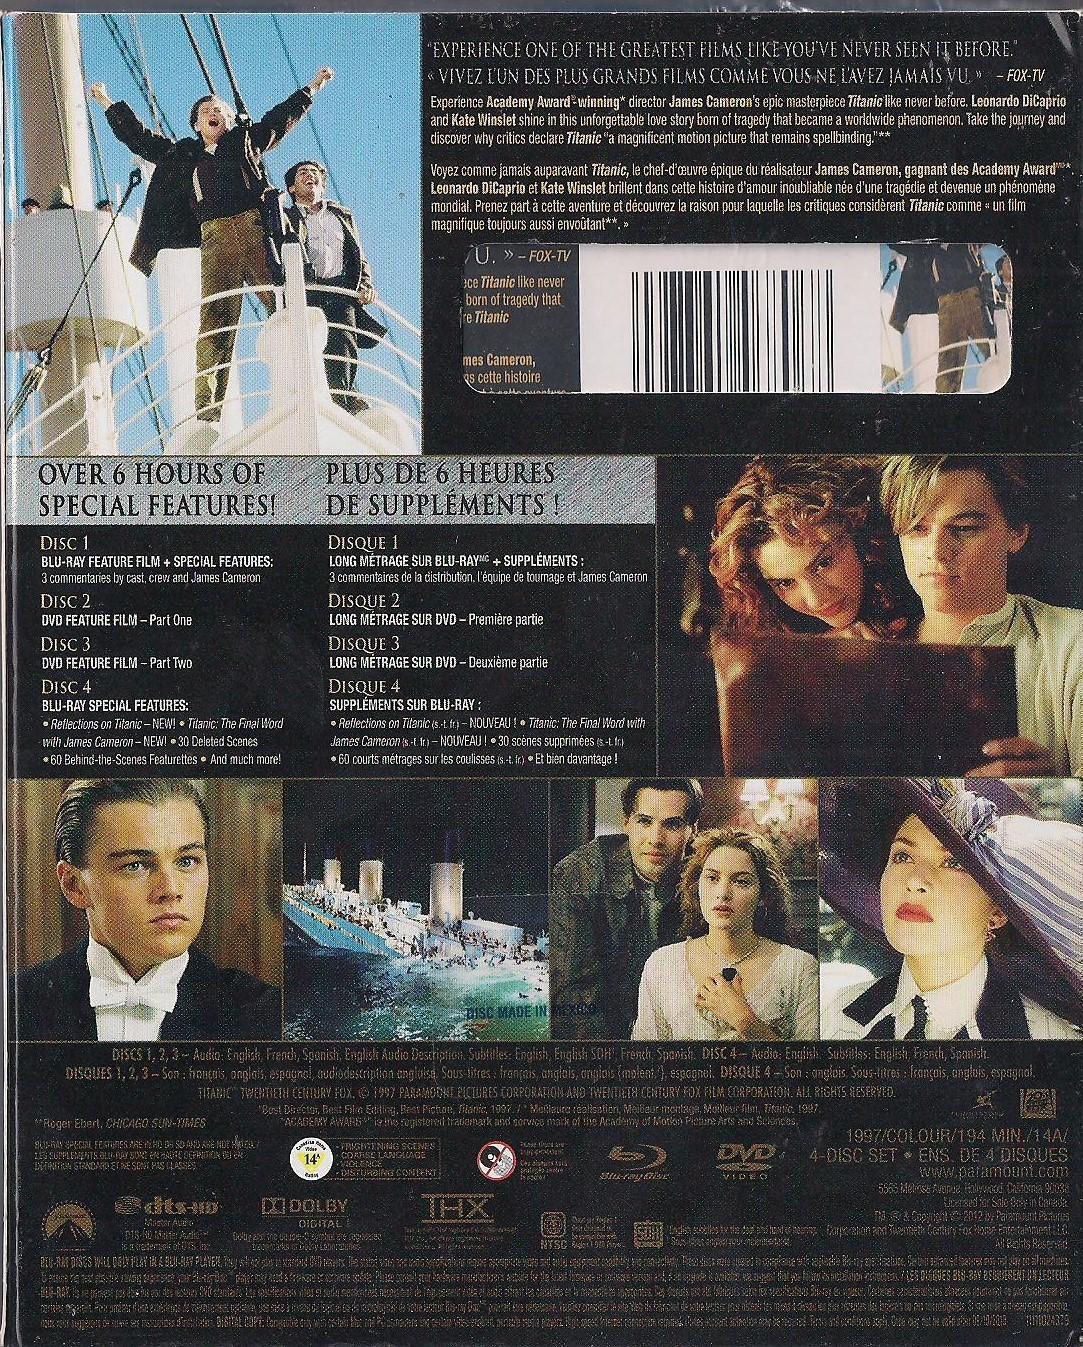 titanic blu ray  The Titanic (Blu-Ray + DVD + Digital Copy 4 and 50 similar items